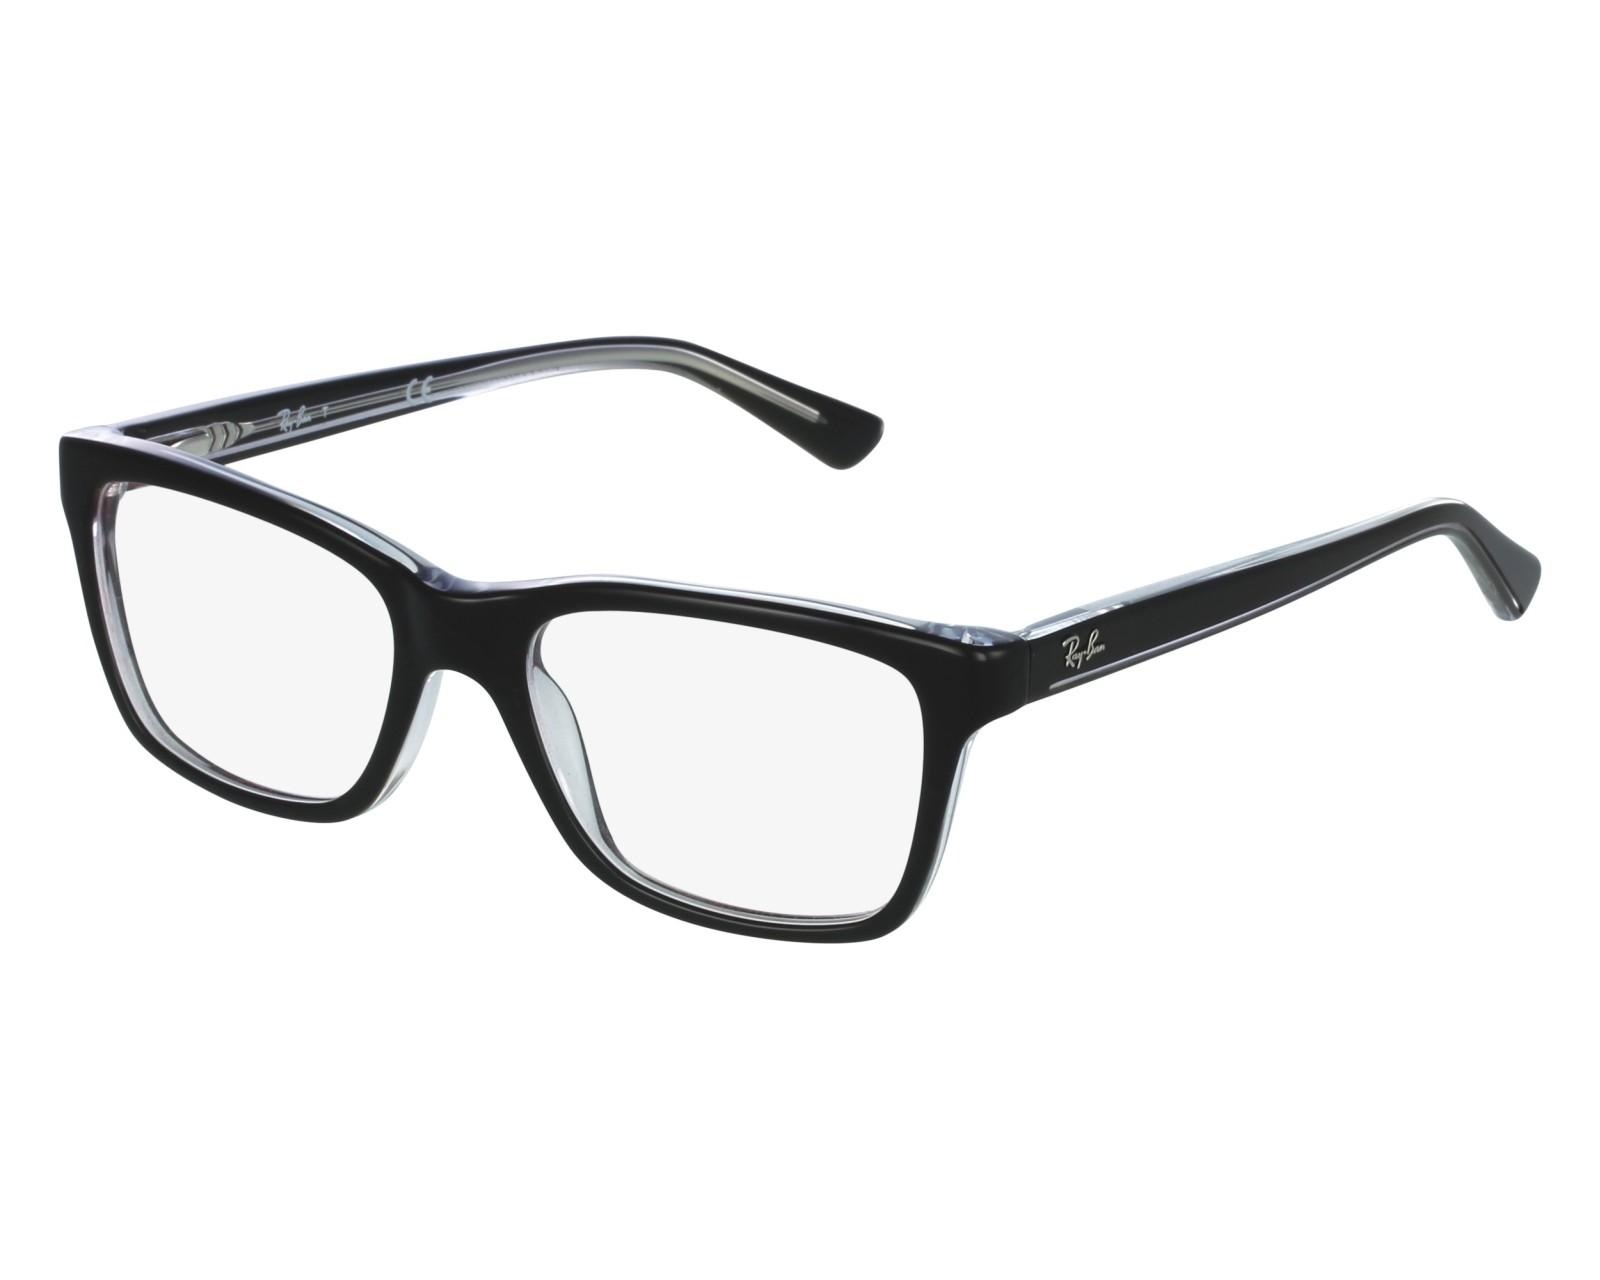 b7ee3b7a34 eyeglasses Ray-Ban RY-1536 3529 48-16 Black Crystal front view